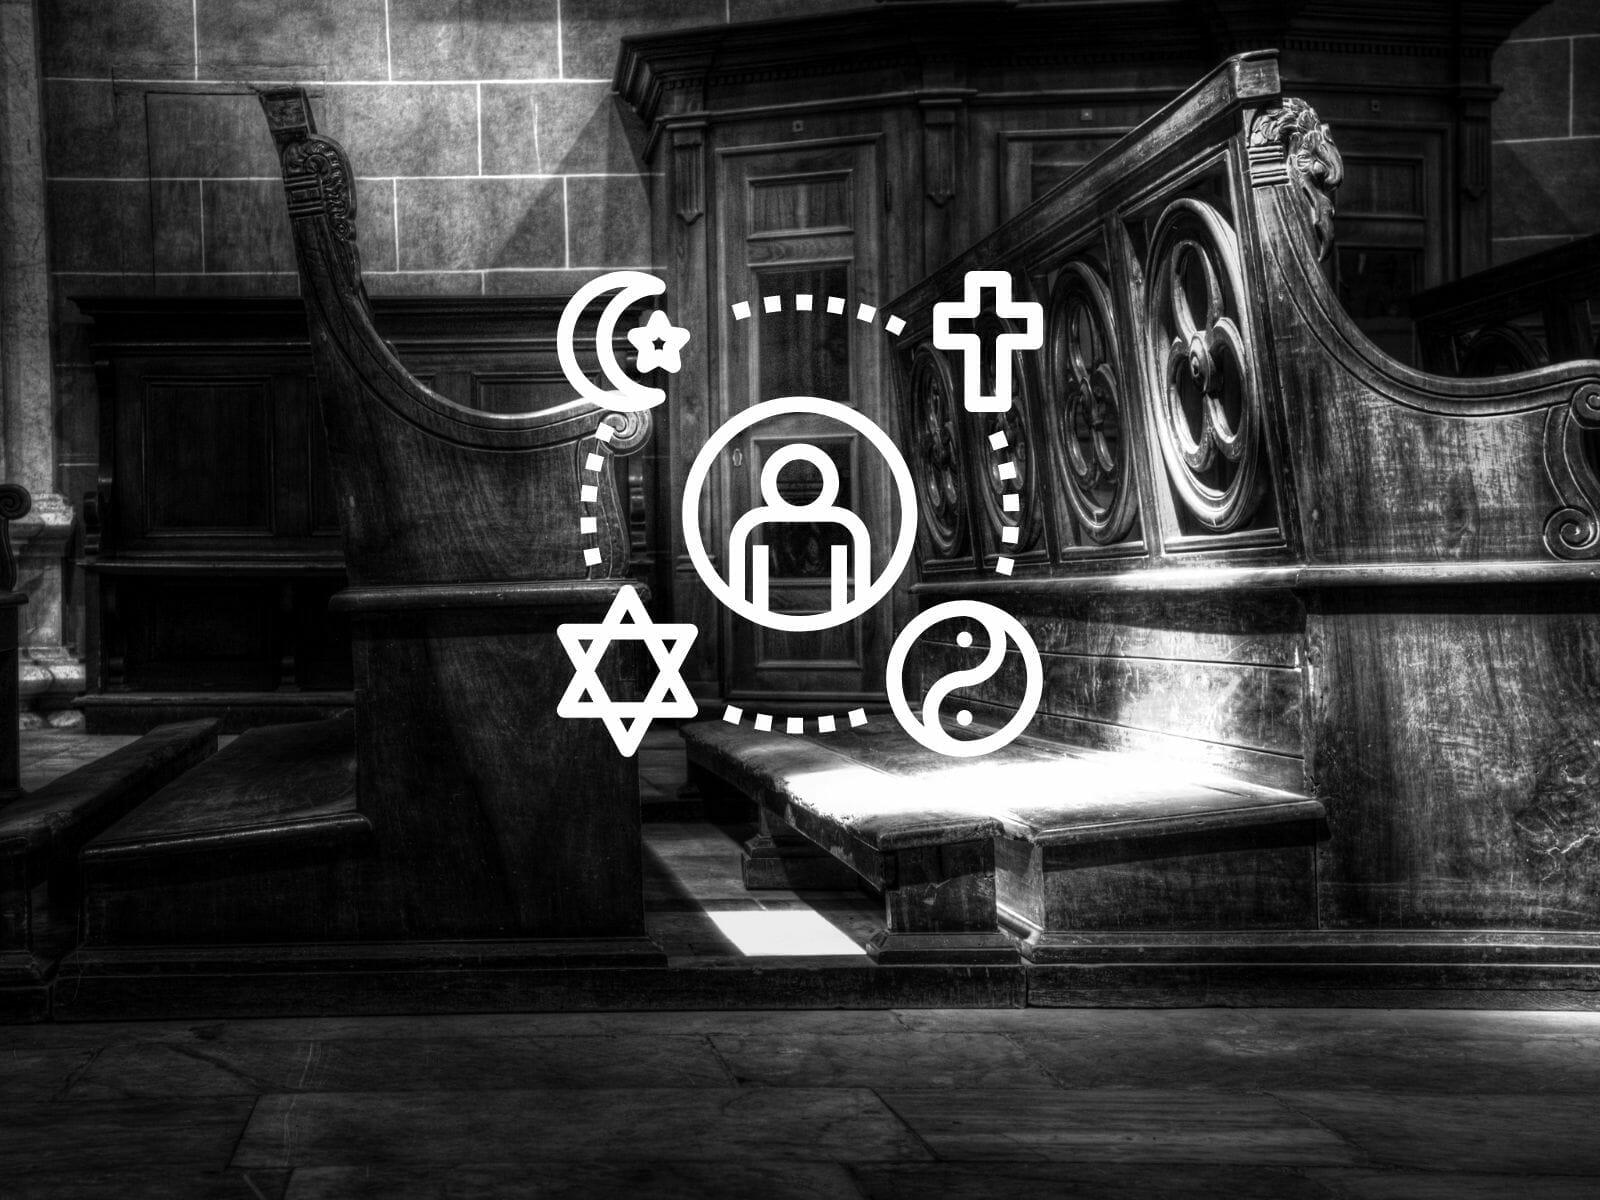 Interfaith & Interspiritual